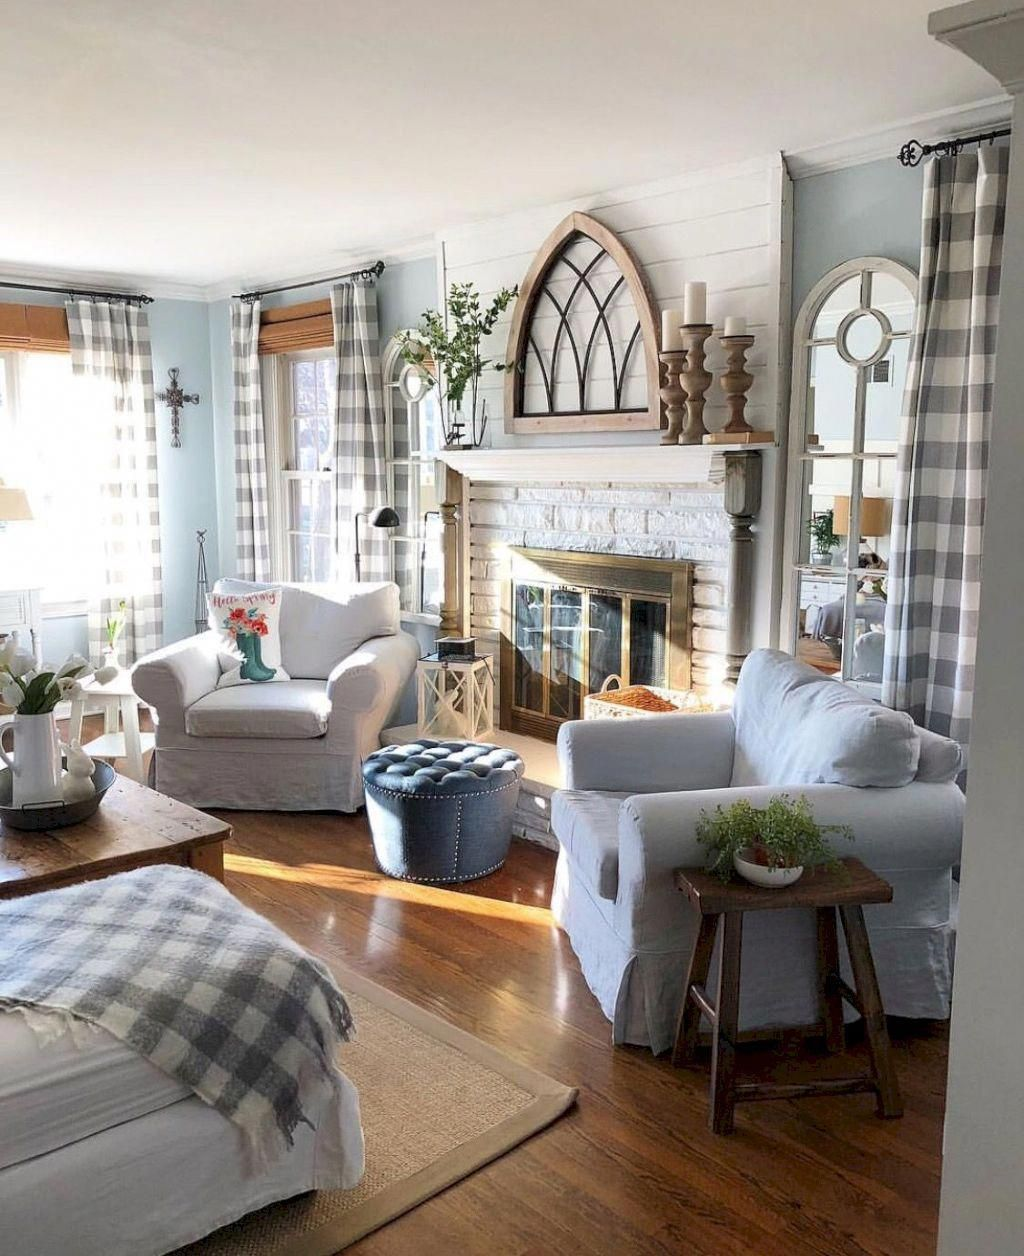 30 Rustic Farmhouse Living Room Design And Decor Ideas For Your Home Homedecor Farmhouse Decor Living Room Farm House Living Room Modern Farmhouse Living Room #rustic #living #room #couch